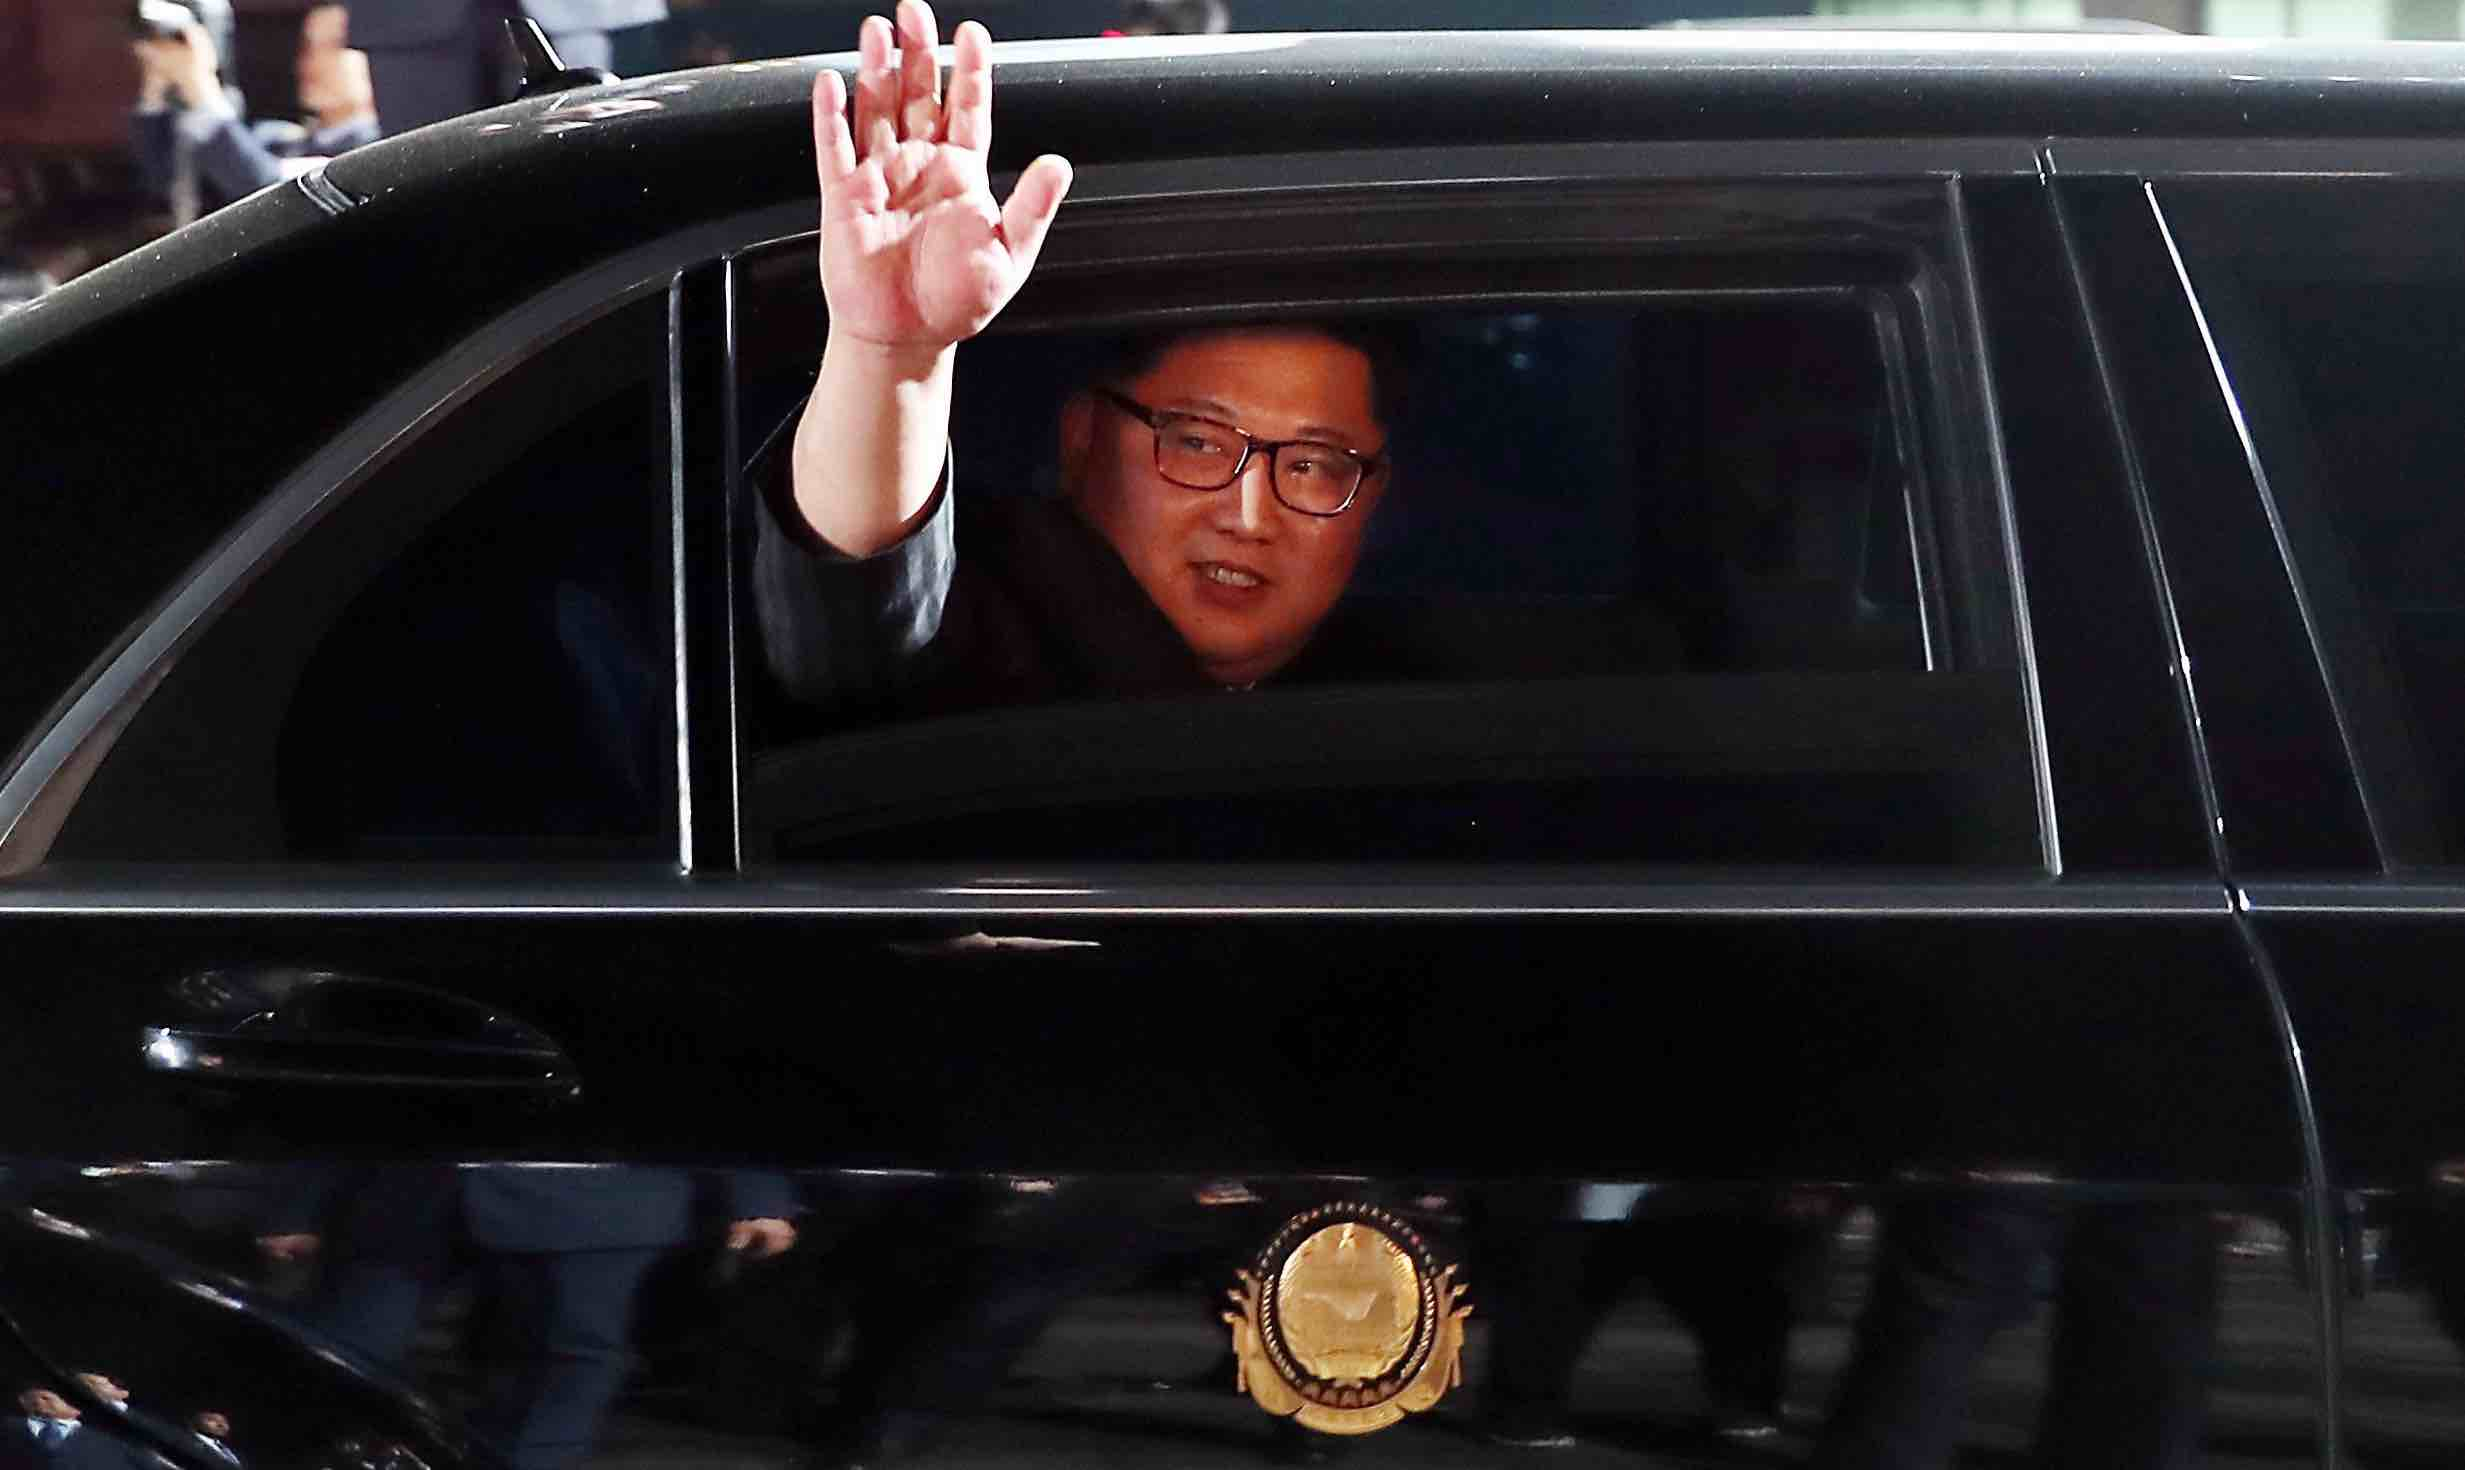 North Korean leader Kim Jong-un waves when departing the inter-Korean summit in Panmunjom last month (Photo: Getty Images)